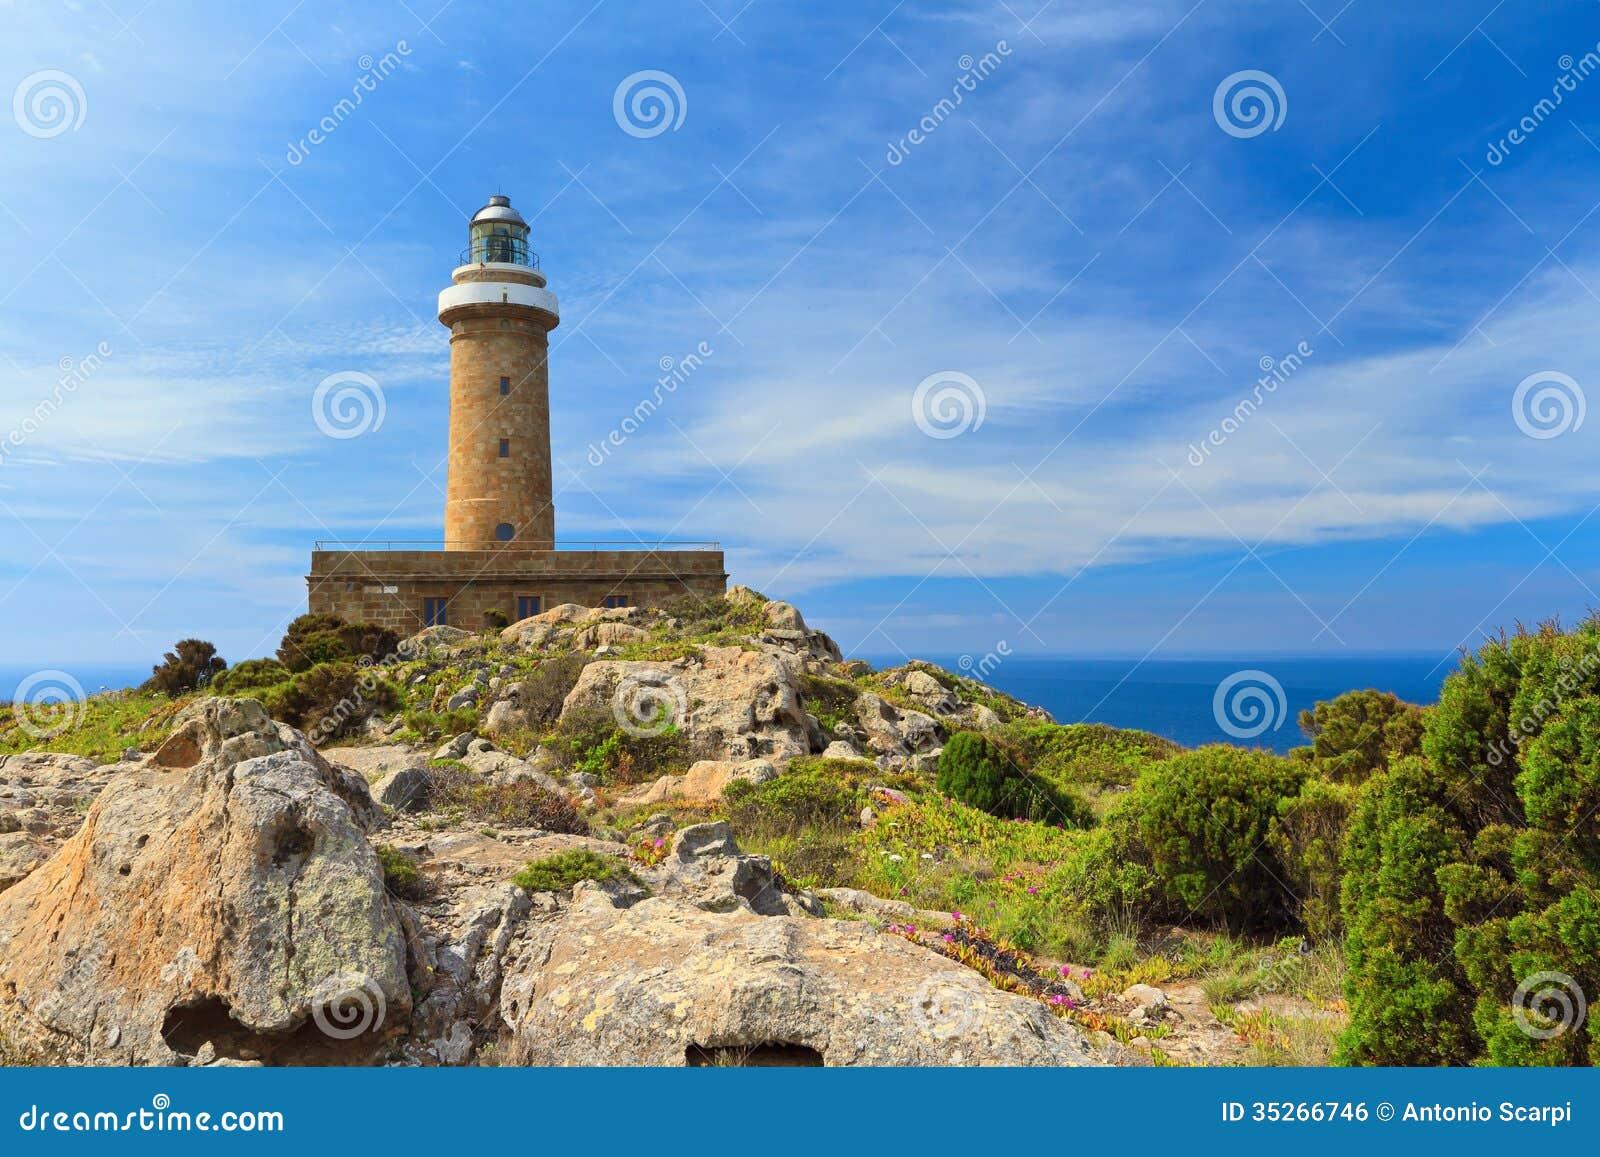 San pietro island lighthouse stock photo image 35266746 san pietro island lighthouse sciox Gallery